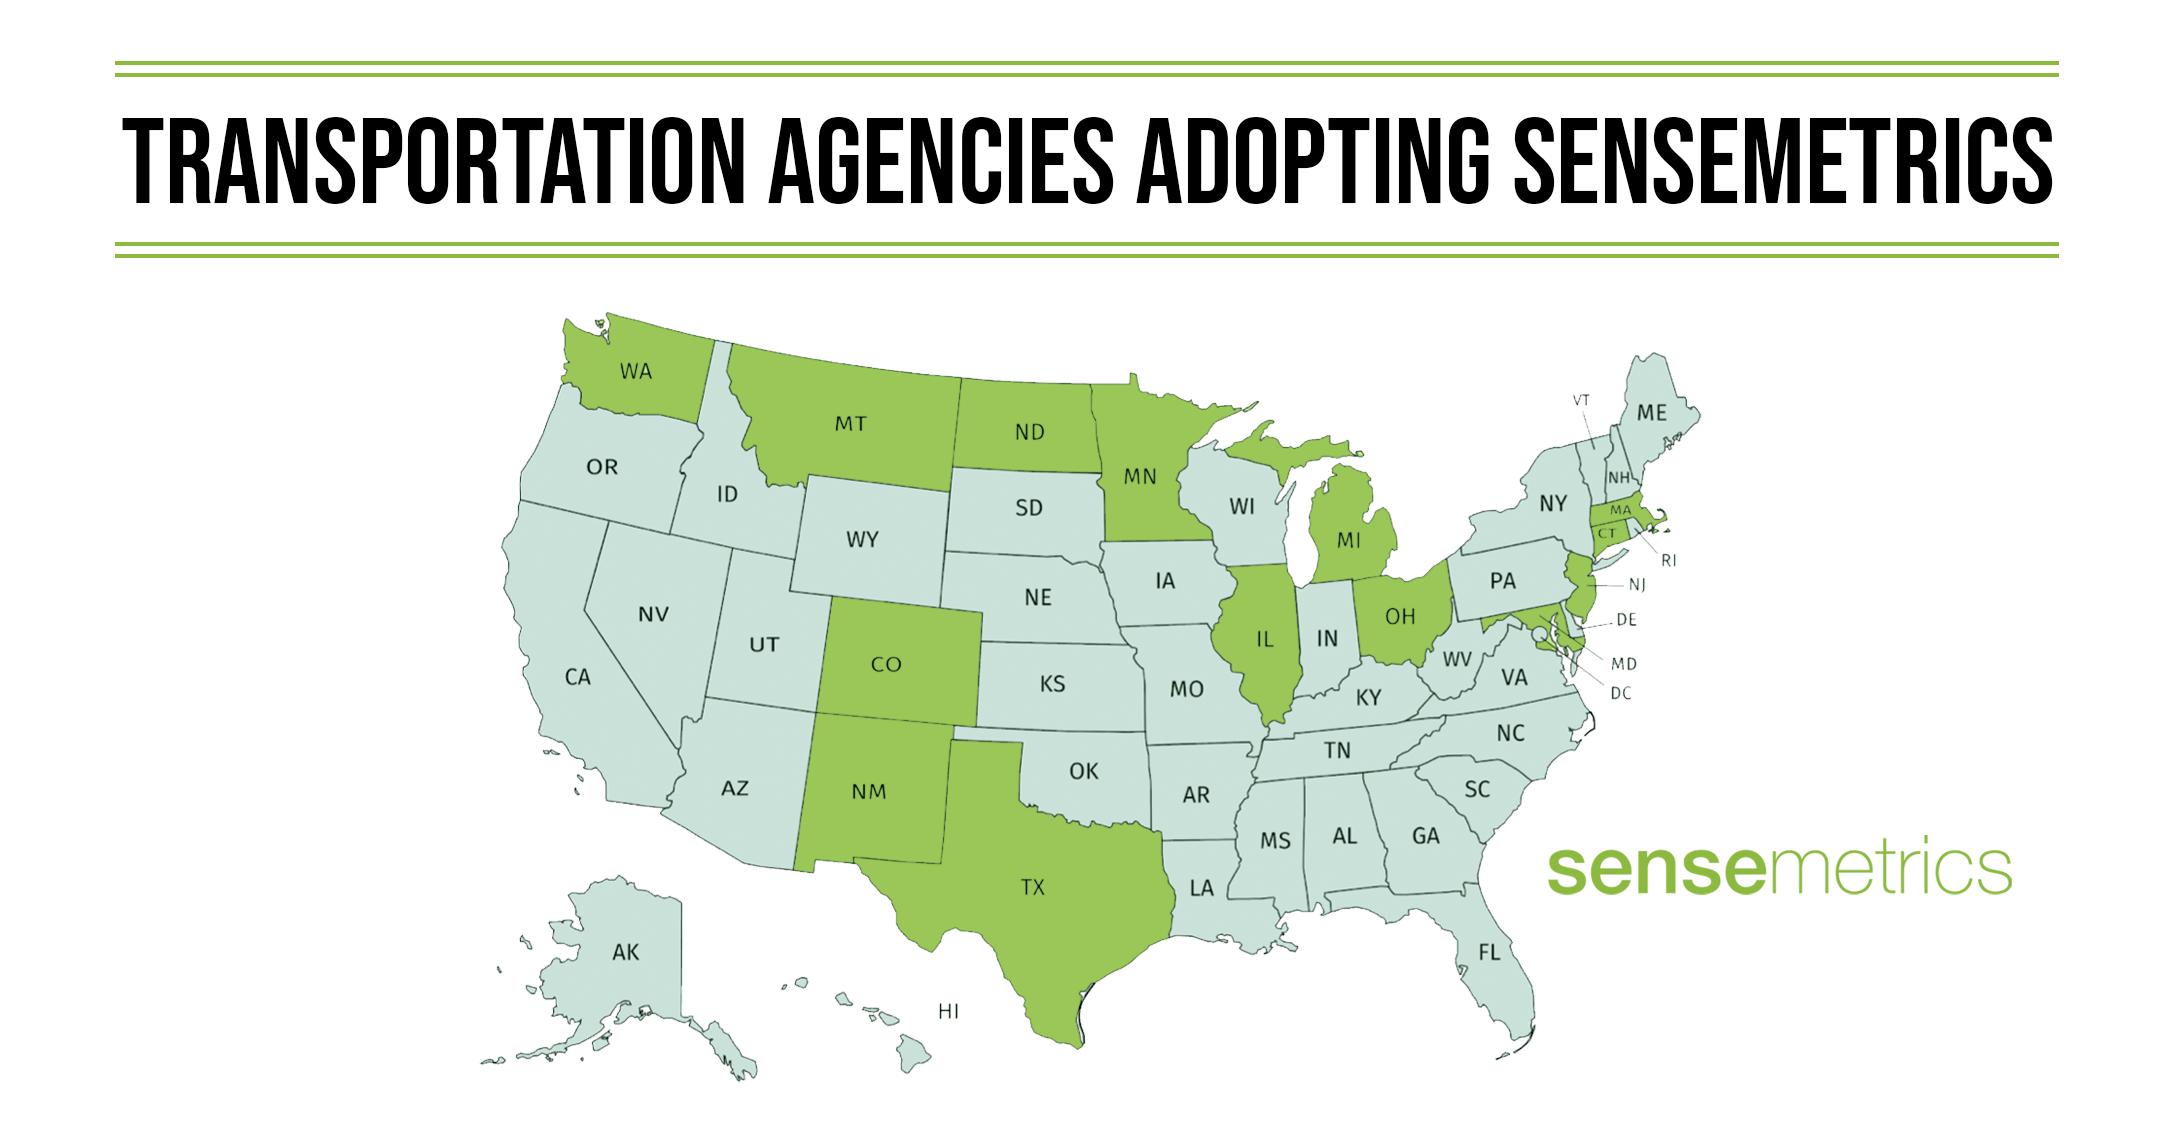 DOTs Adopting sensemetrics